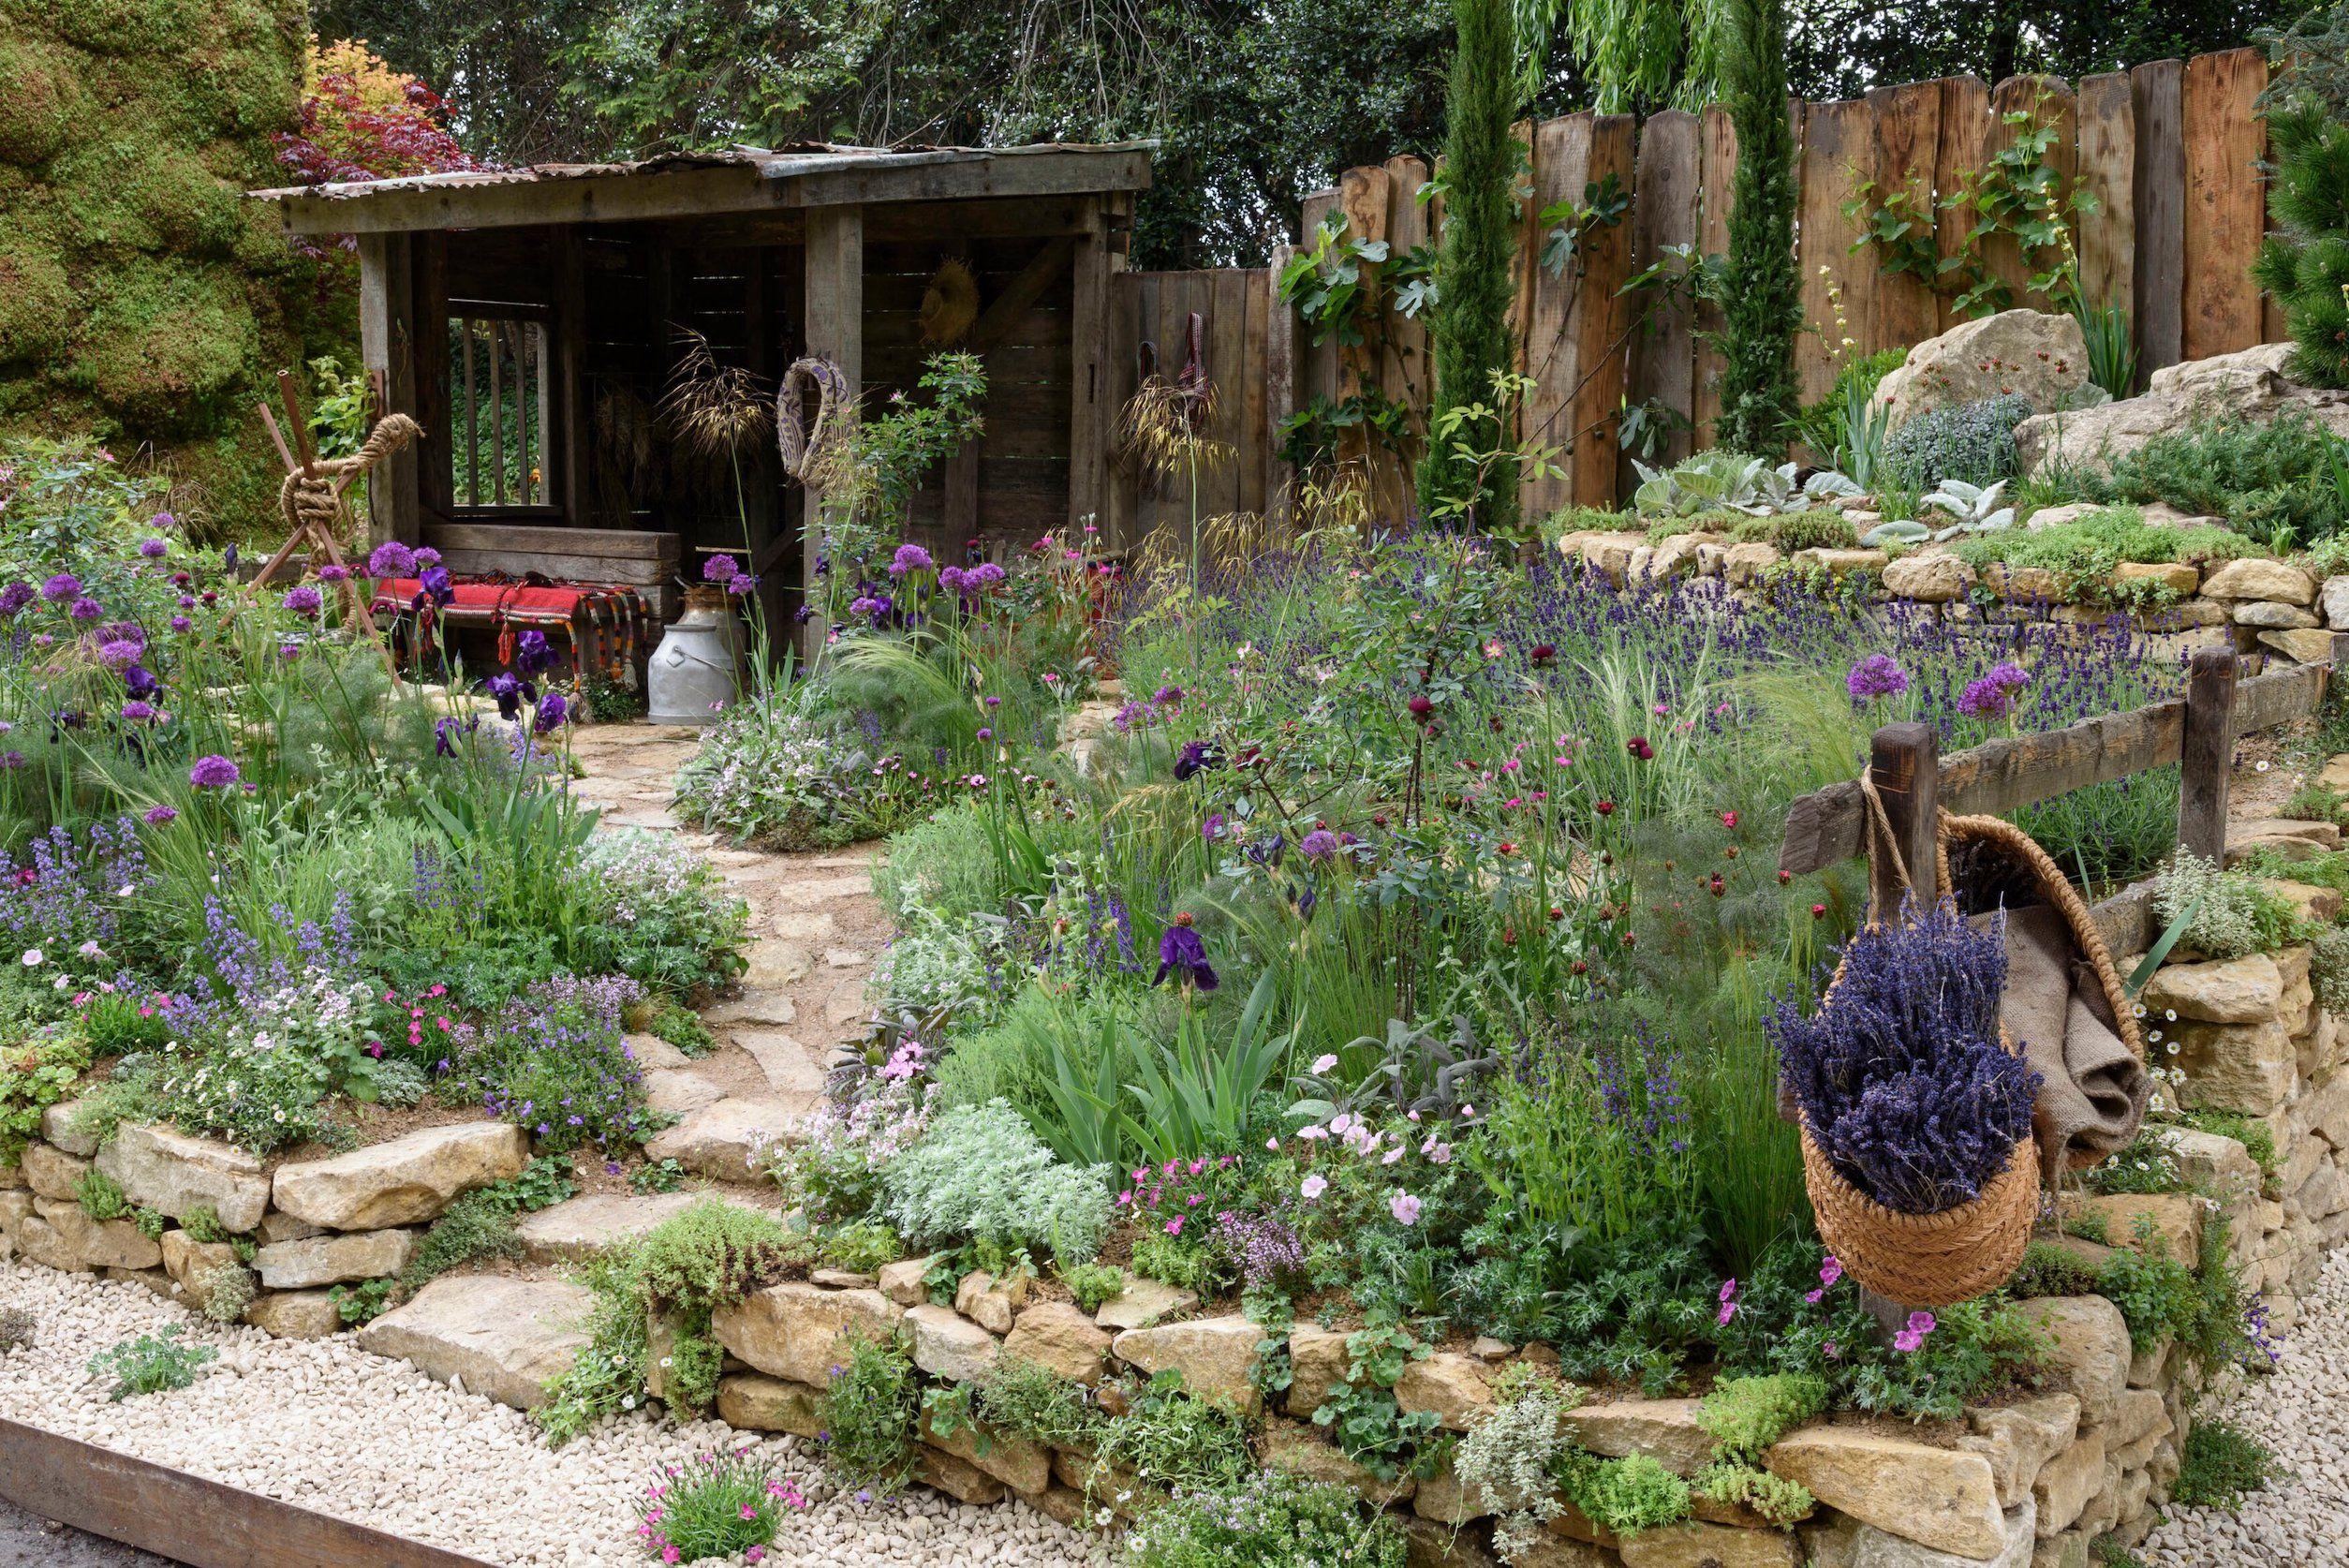 winning chelsea flower show 2019 gardens: all 28 gardens in photos